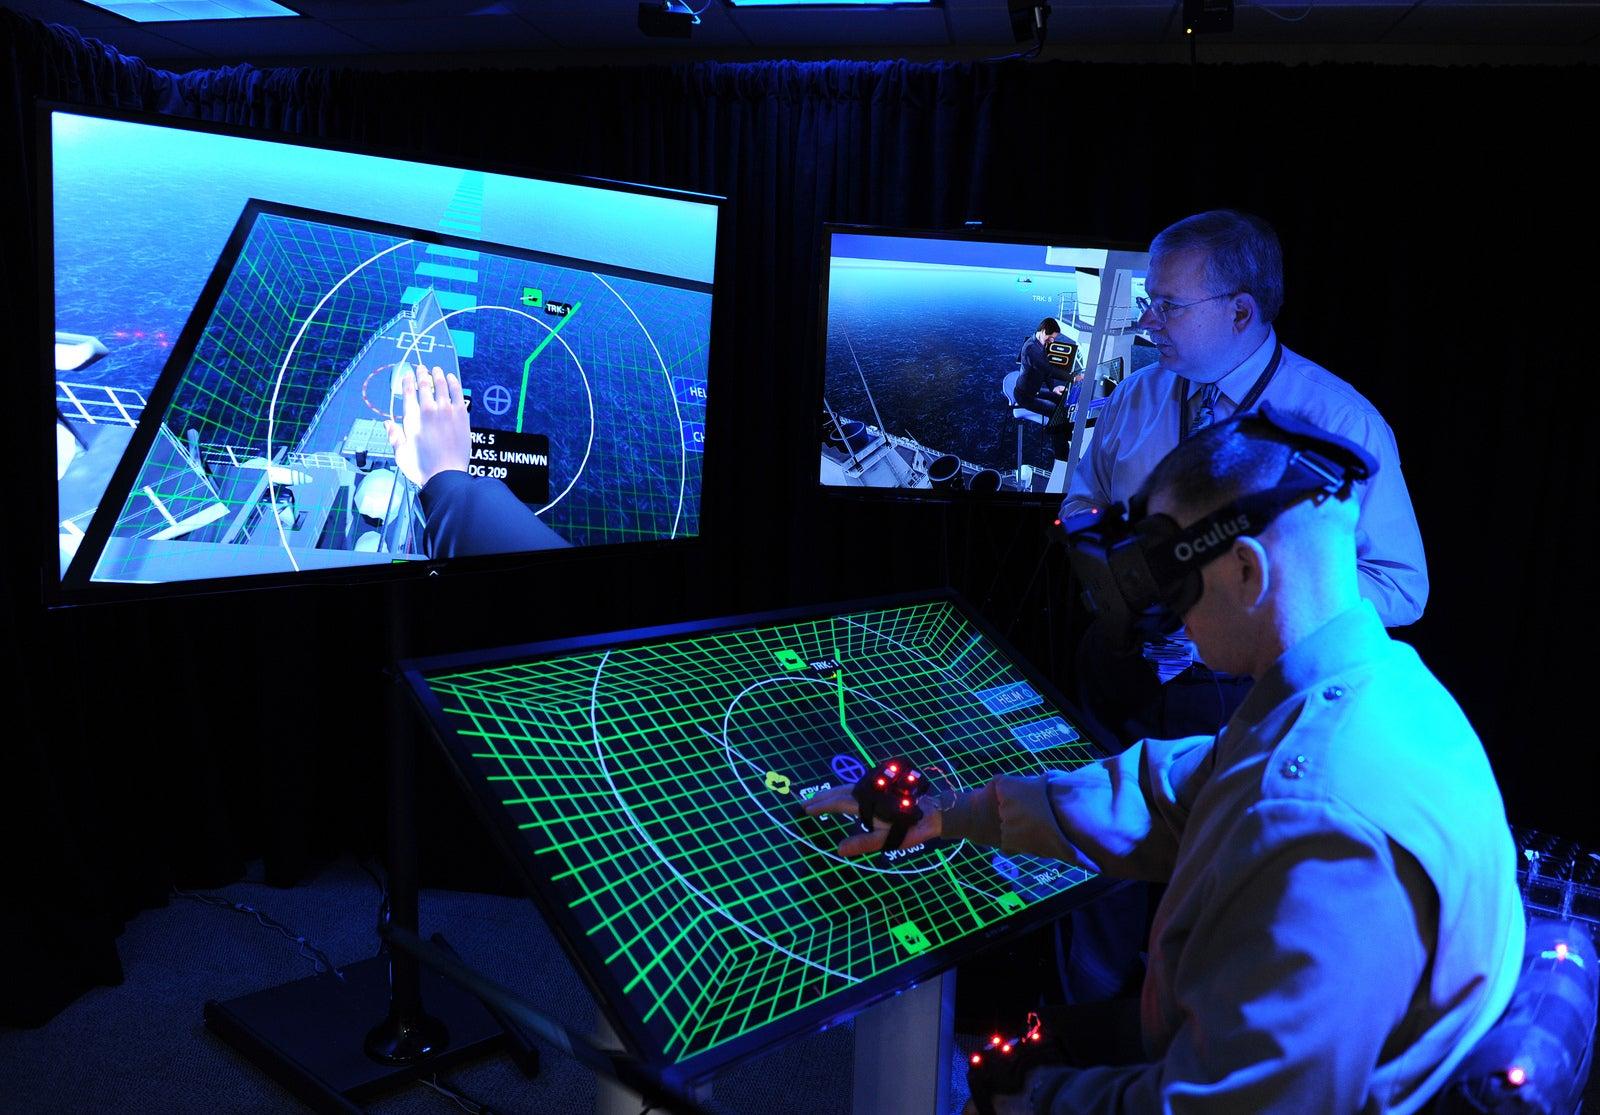 Big Pic: The U.S. Navy Tests A Virtual Reality Headset